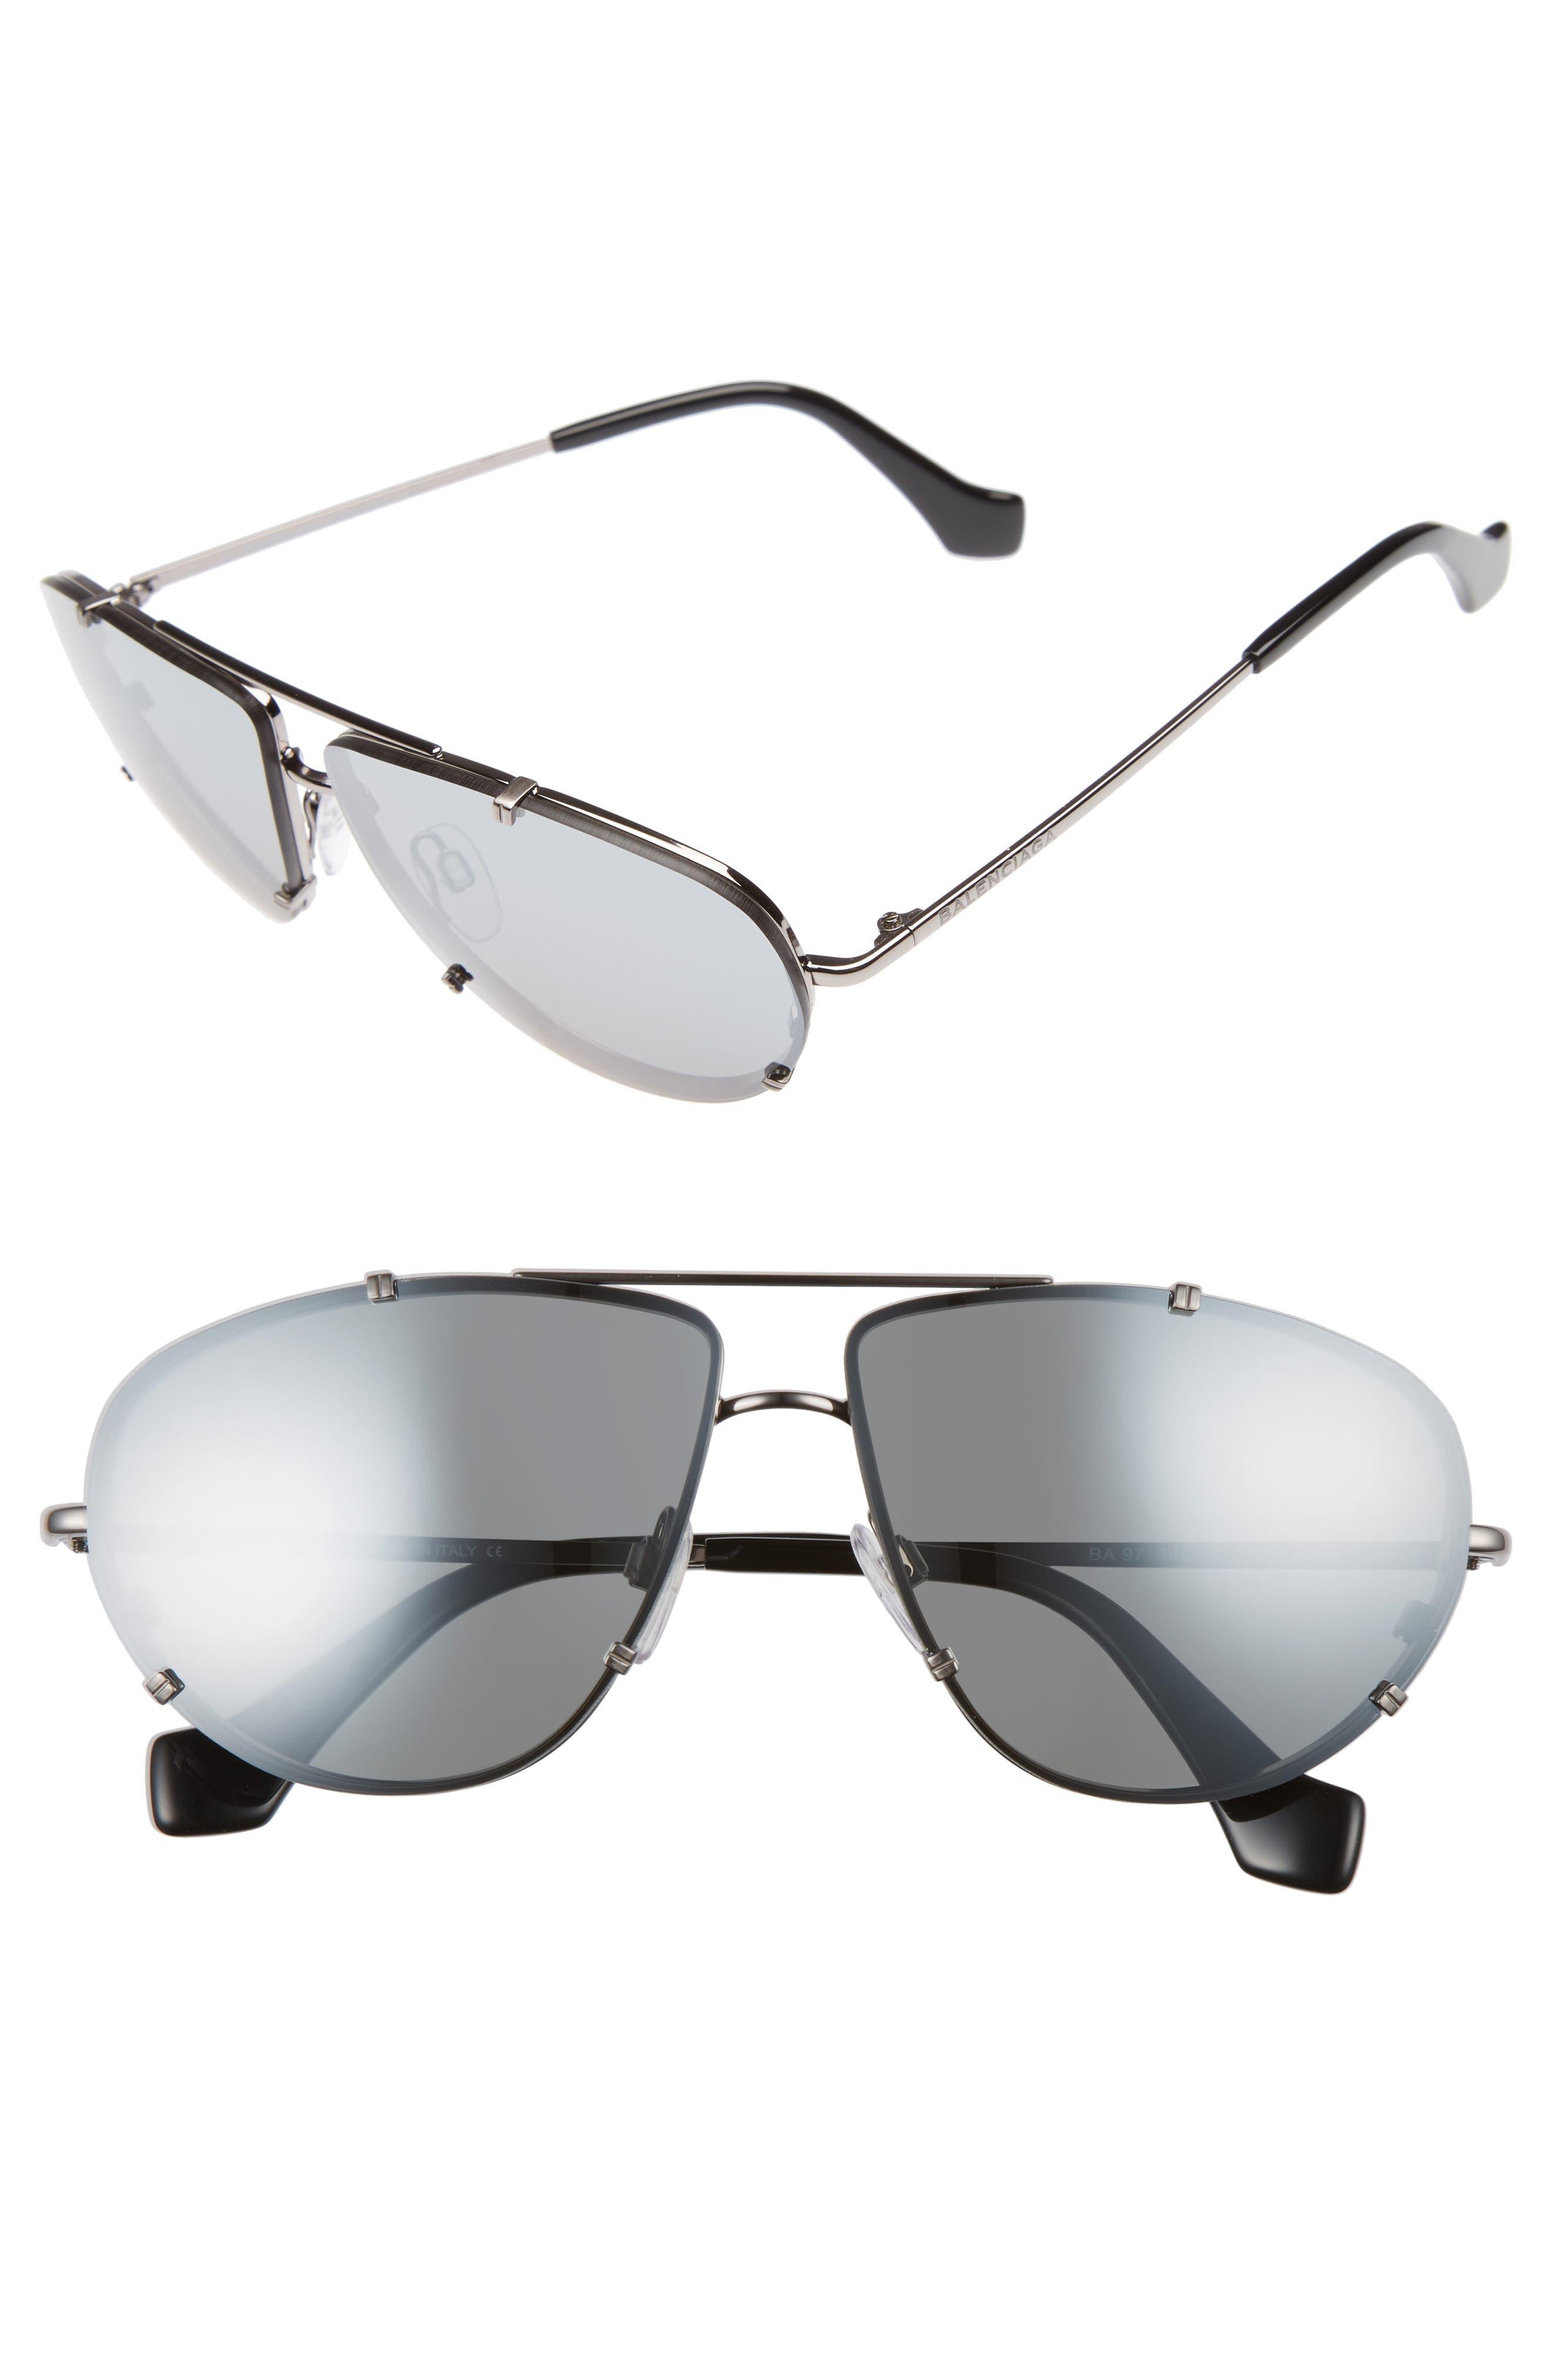 62mm Aviator Sunglasses,                             Main thumbnail 1, color,                             Ruthenium/ Black/ Smoke Mirror